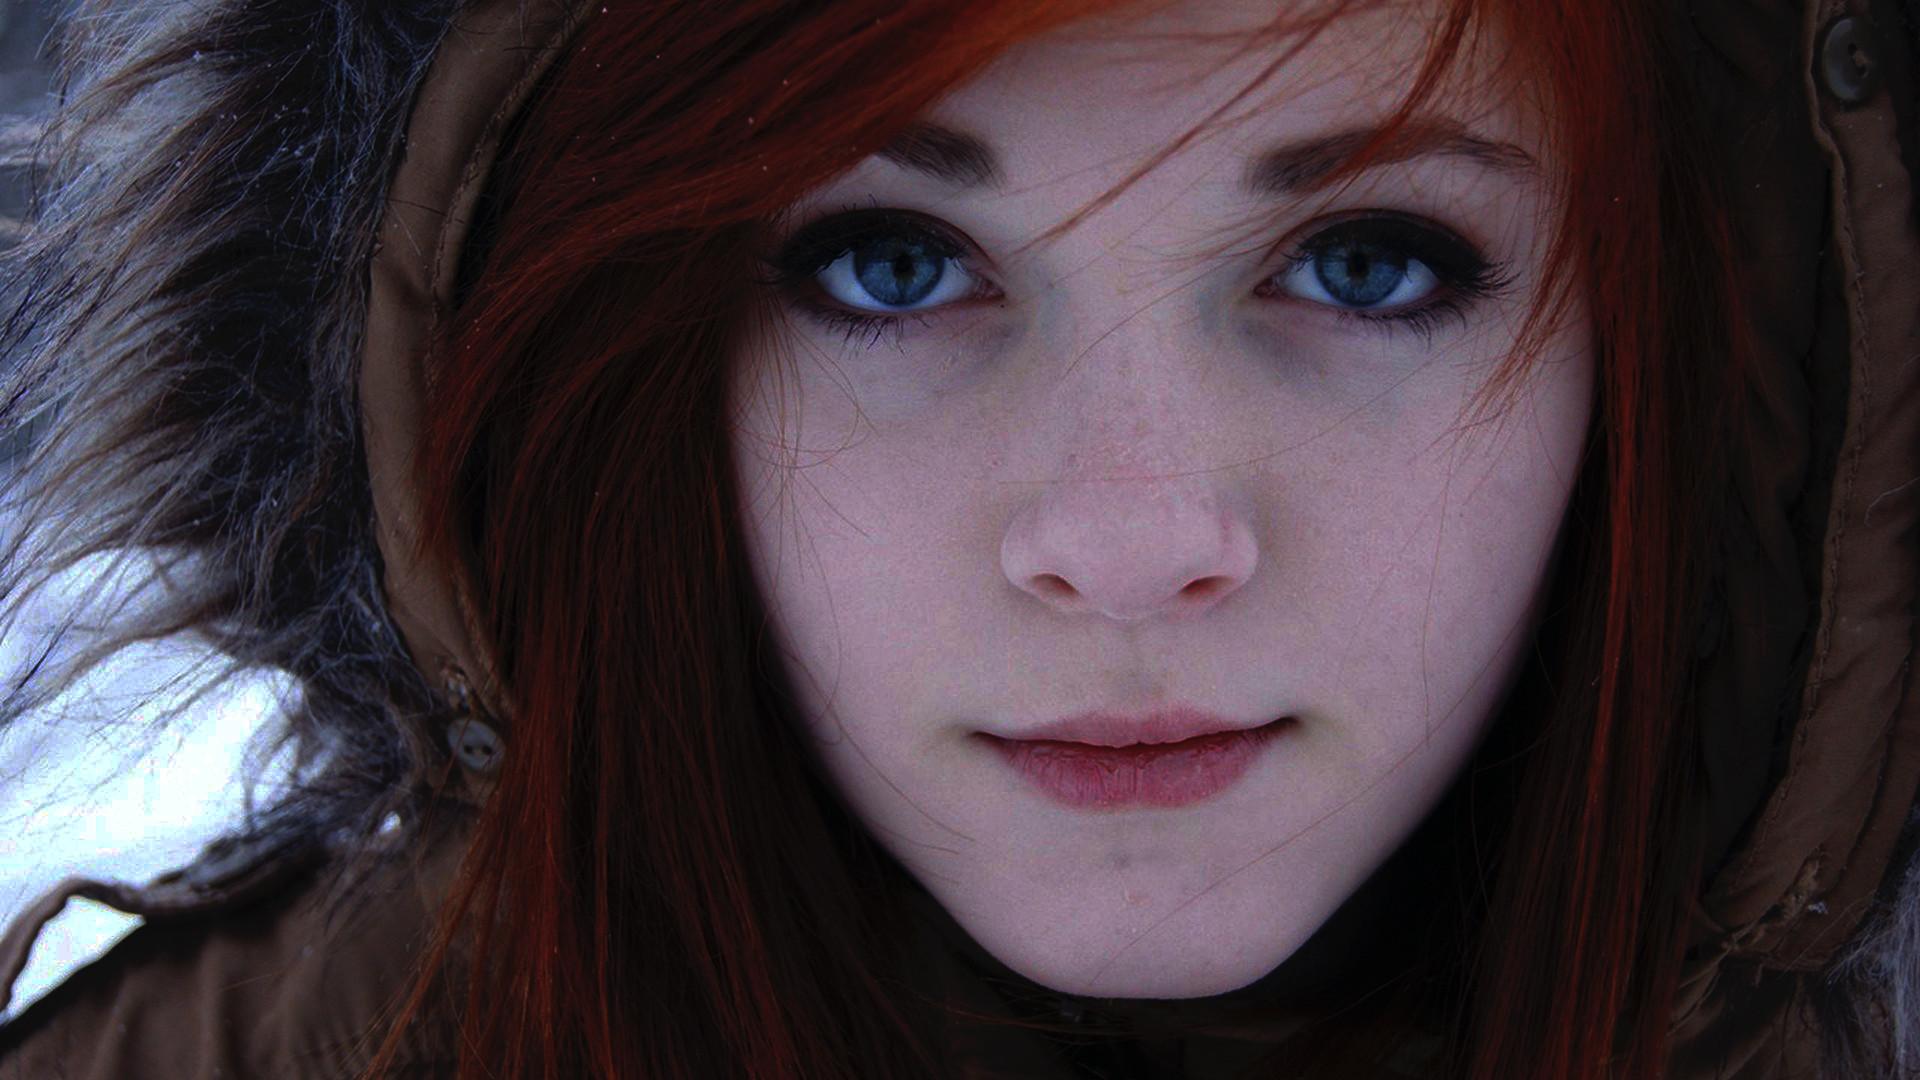 Blue Eyes Women Redhead Face Women Outdoors Closeup Eyes Portrait Model Long Hair Winter Jacket Dark 1920x1080